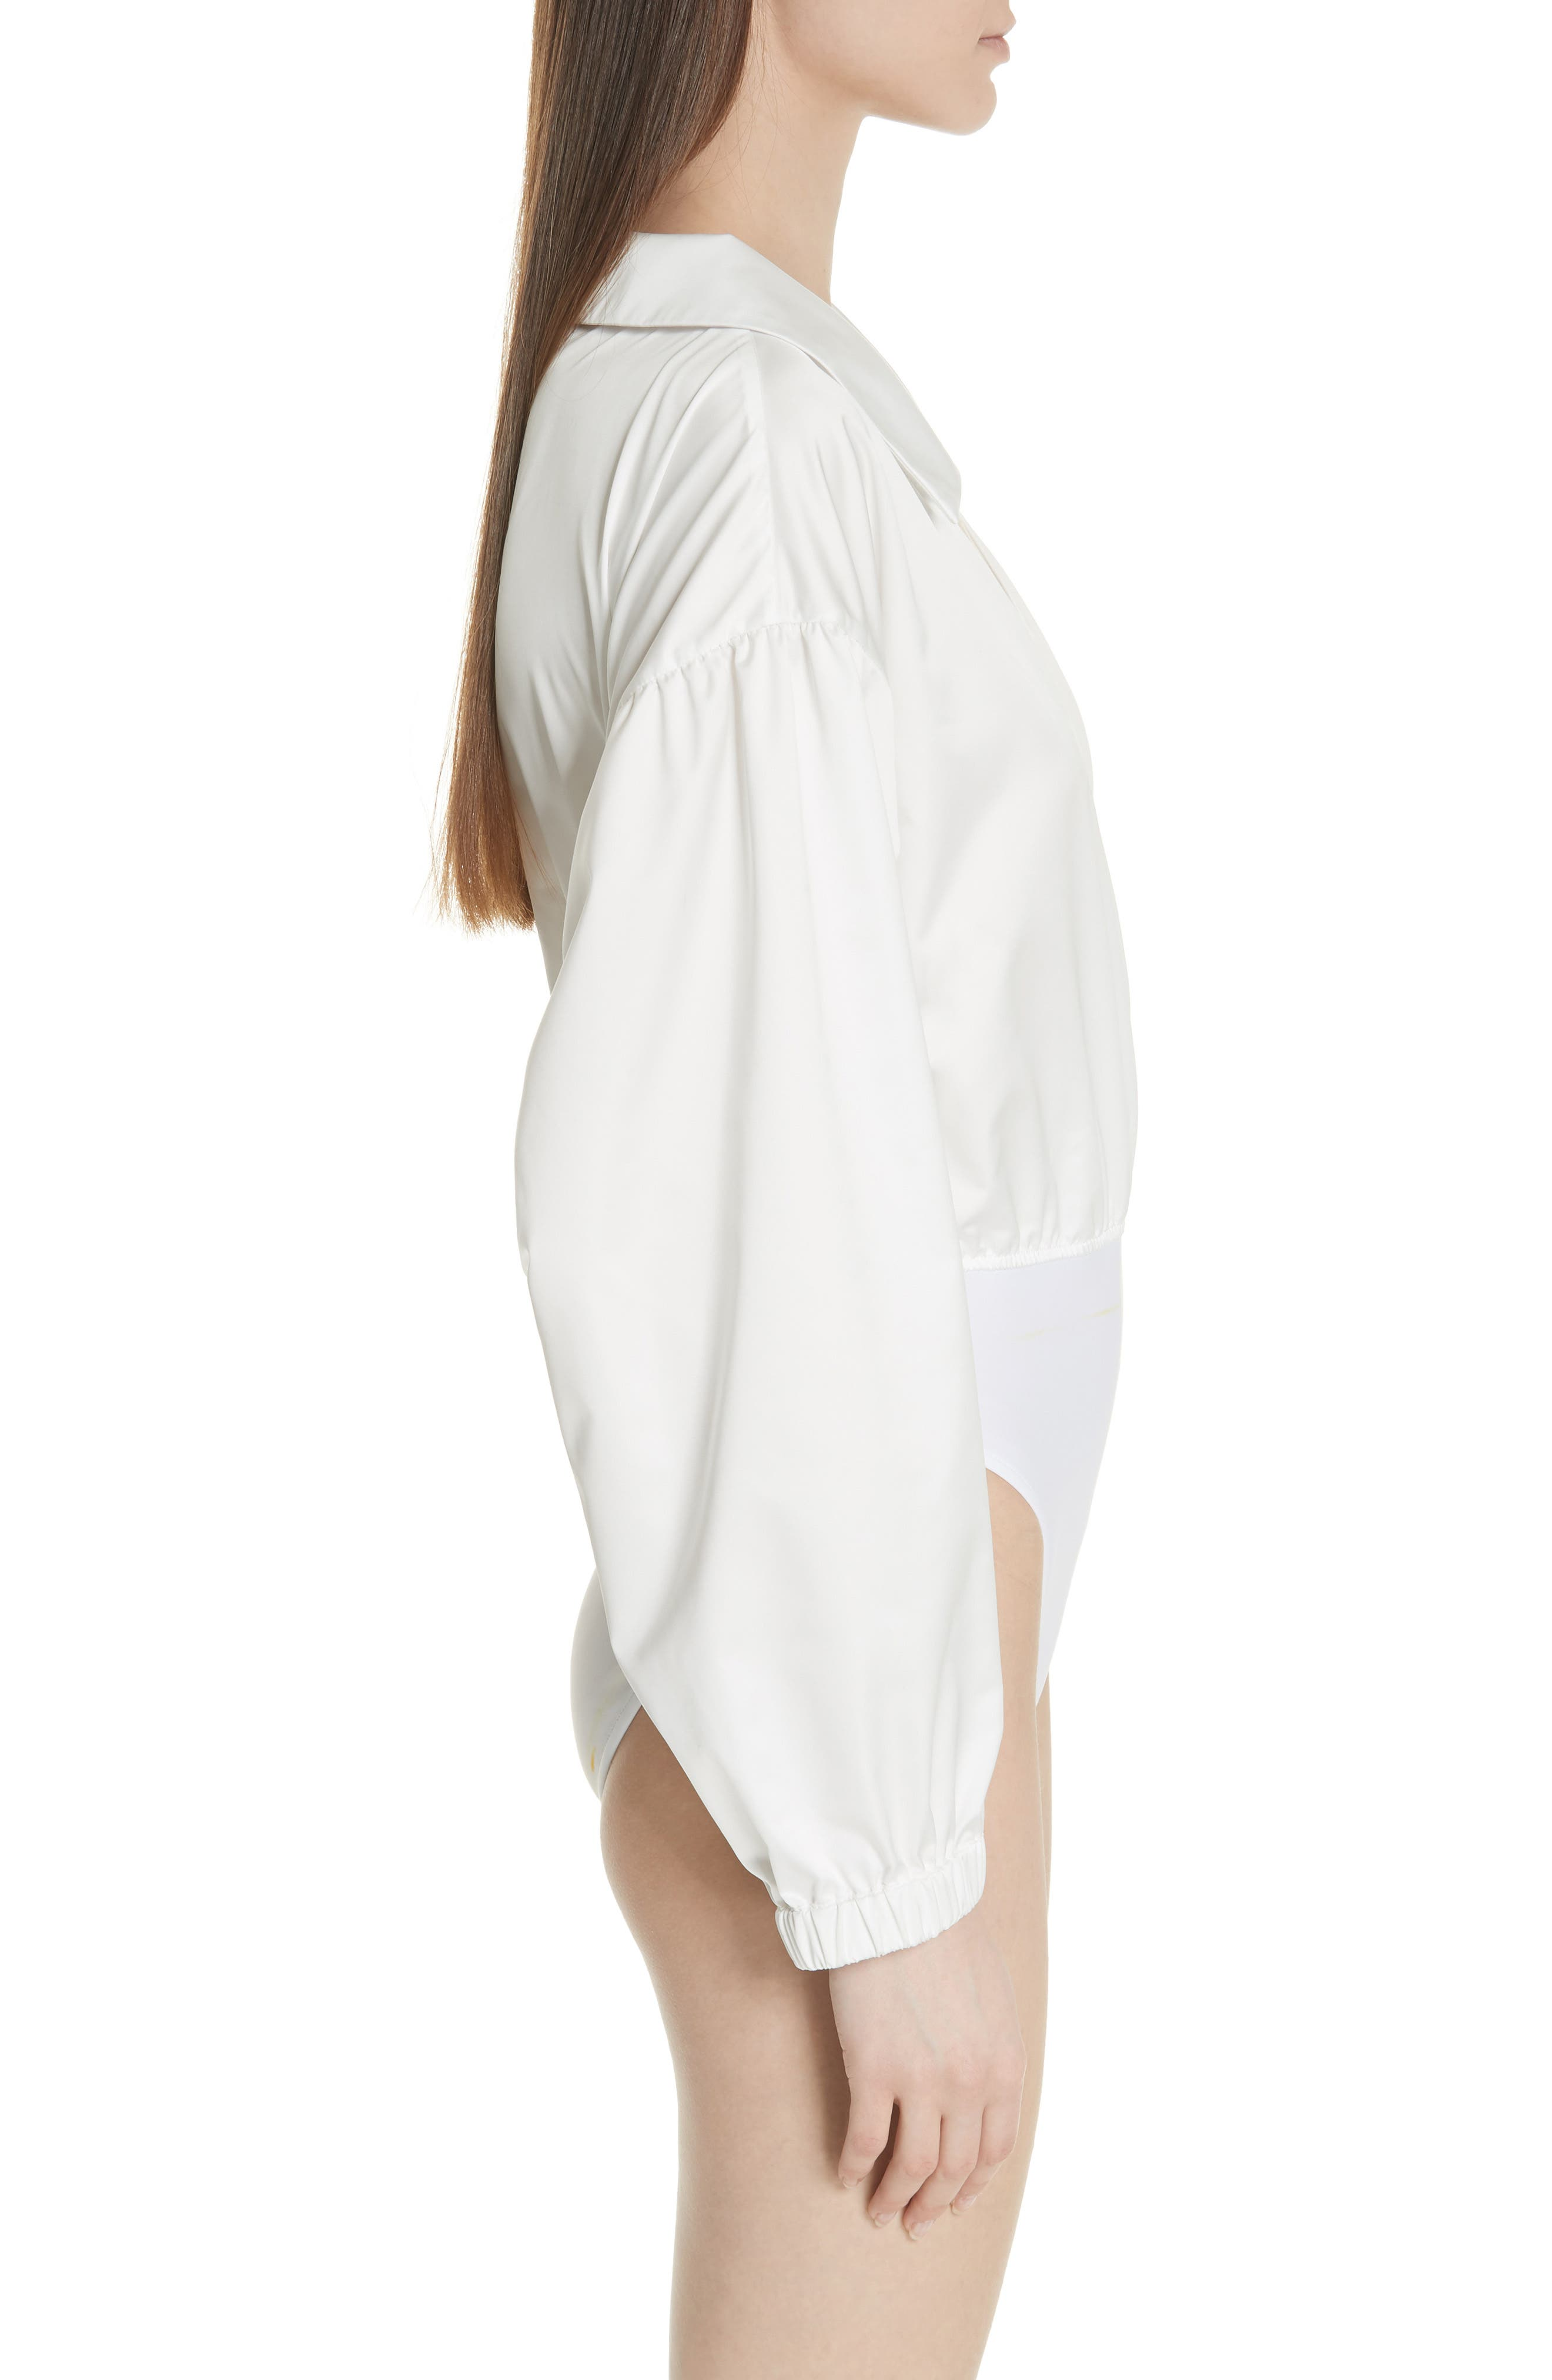 MILLY,                             Italian Duchess Taffeta Wrap Top Bodysuit,                             Alternate thumbnail 3, color,                             150